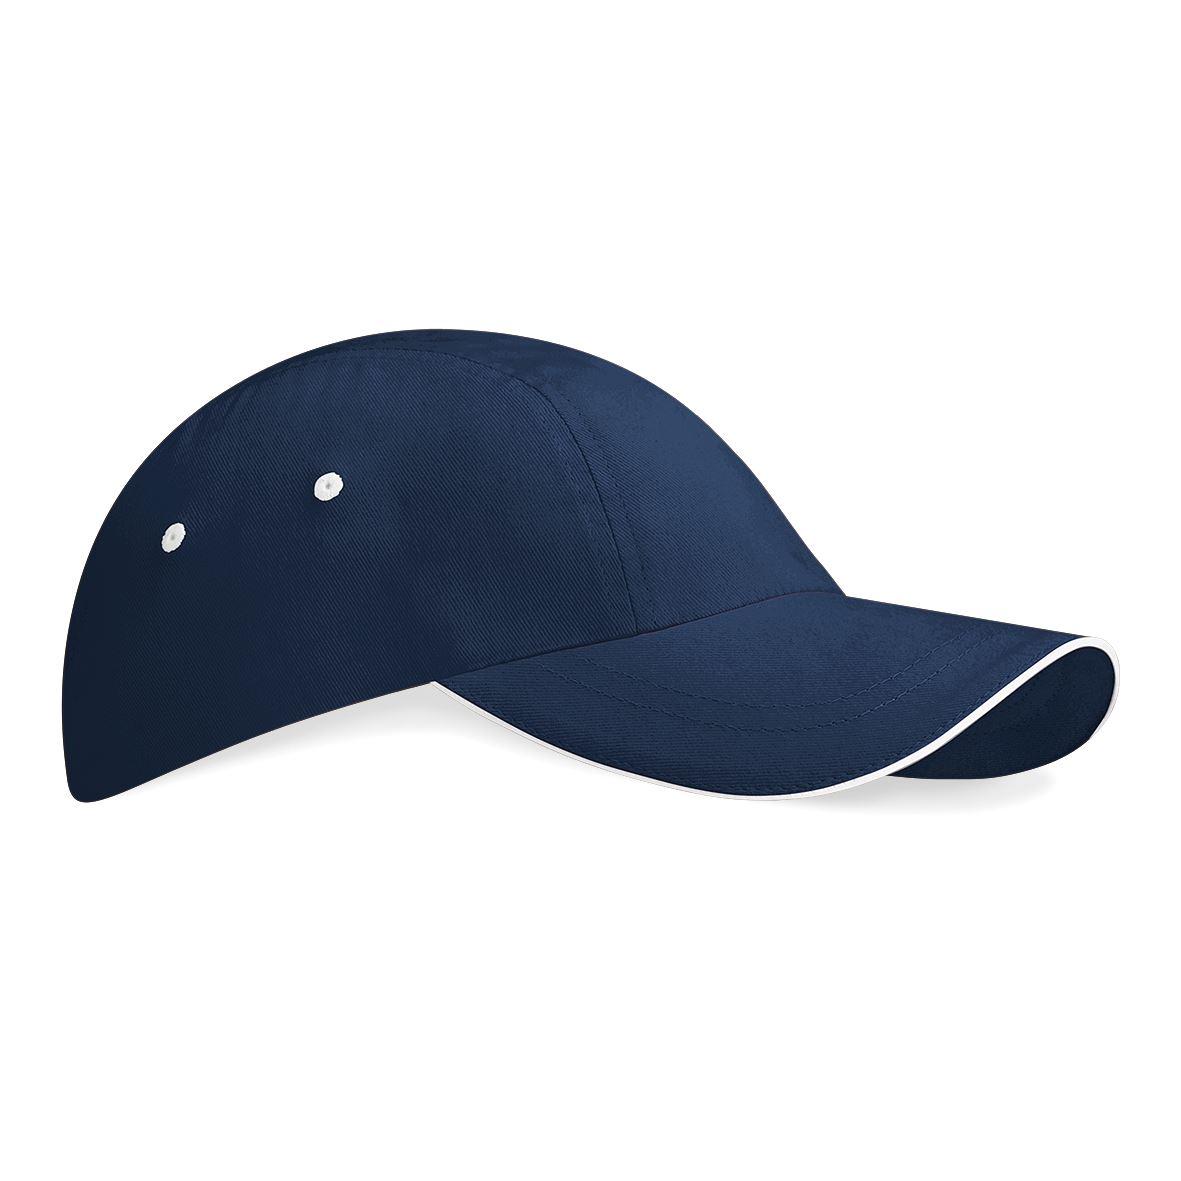 Beechfield-unisex-low-profile-Sport-cap-tennis-Baseball-Golf-hat-100-Baumwolle